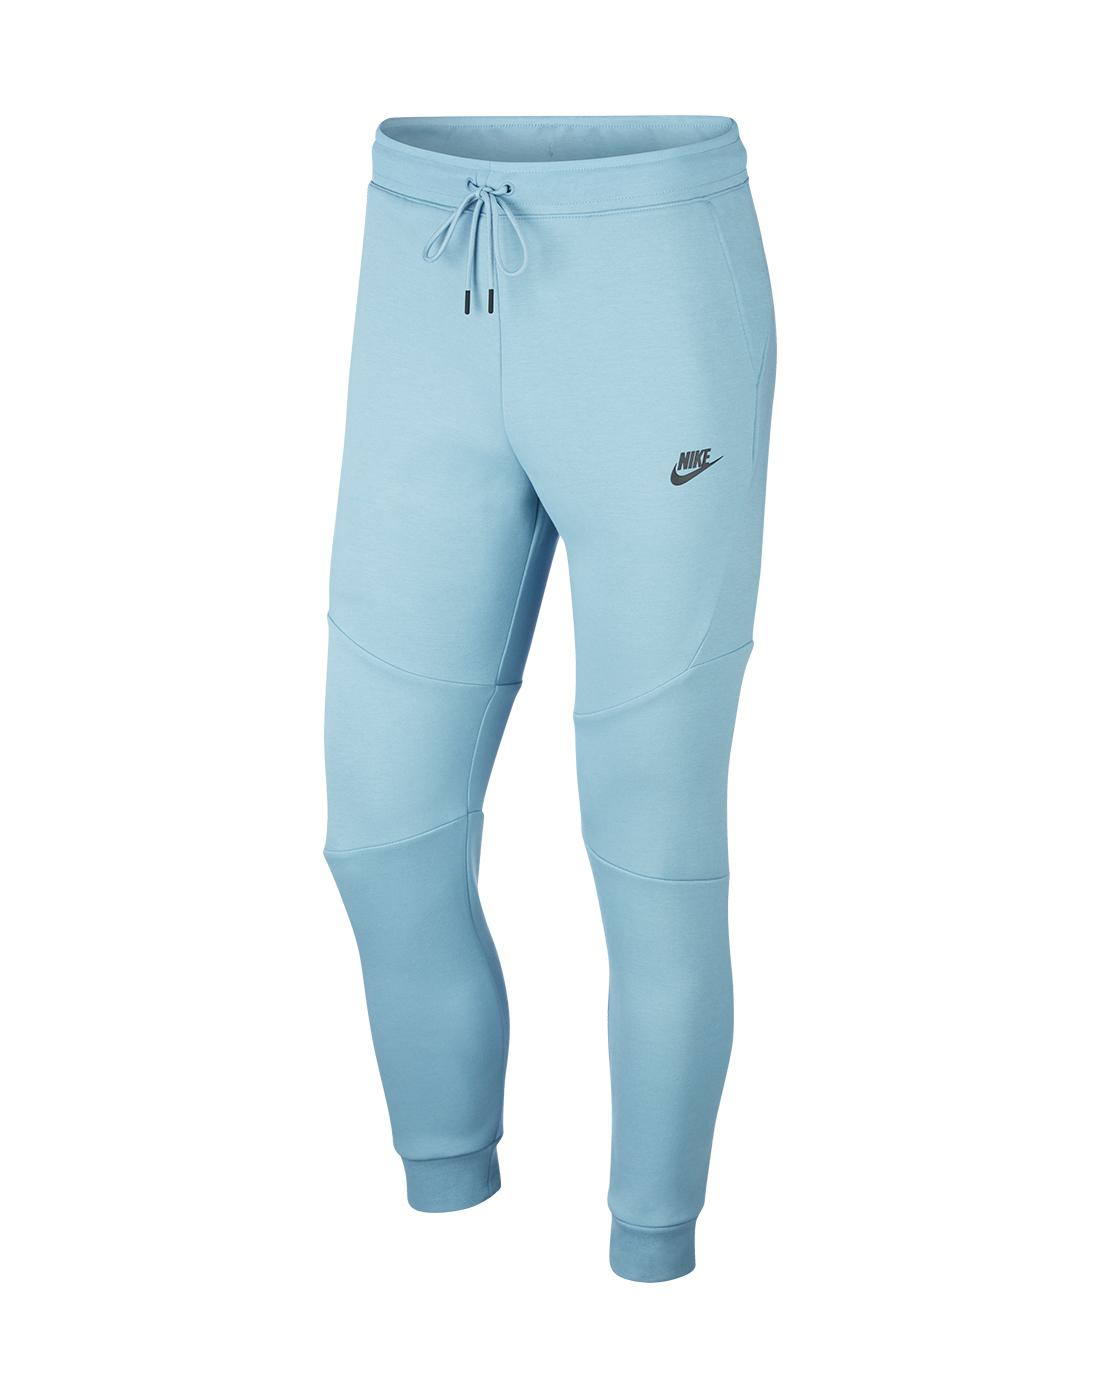 Nike Mens Tech Fleece Joggers Blue Life Style Sports Uk